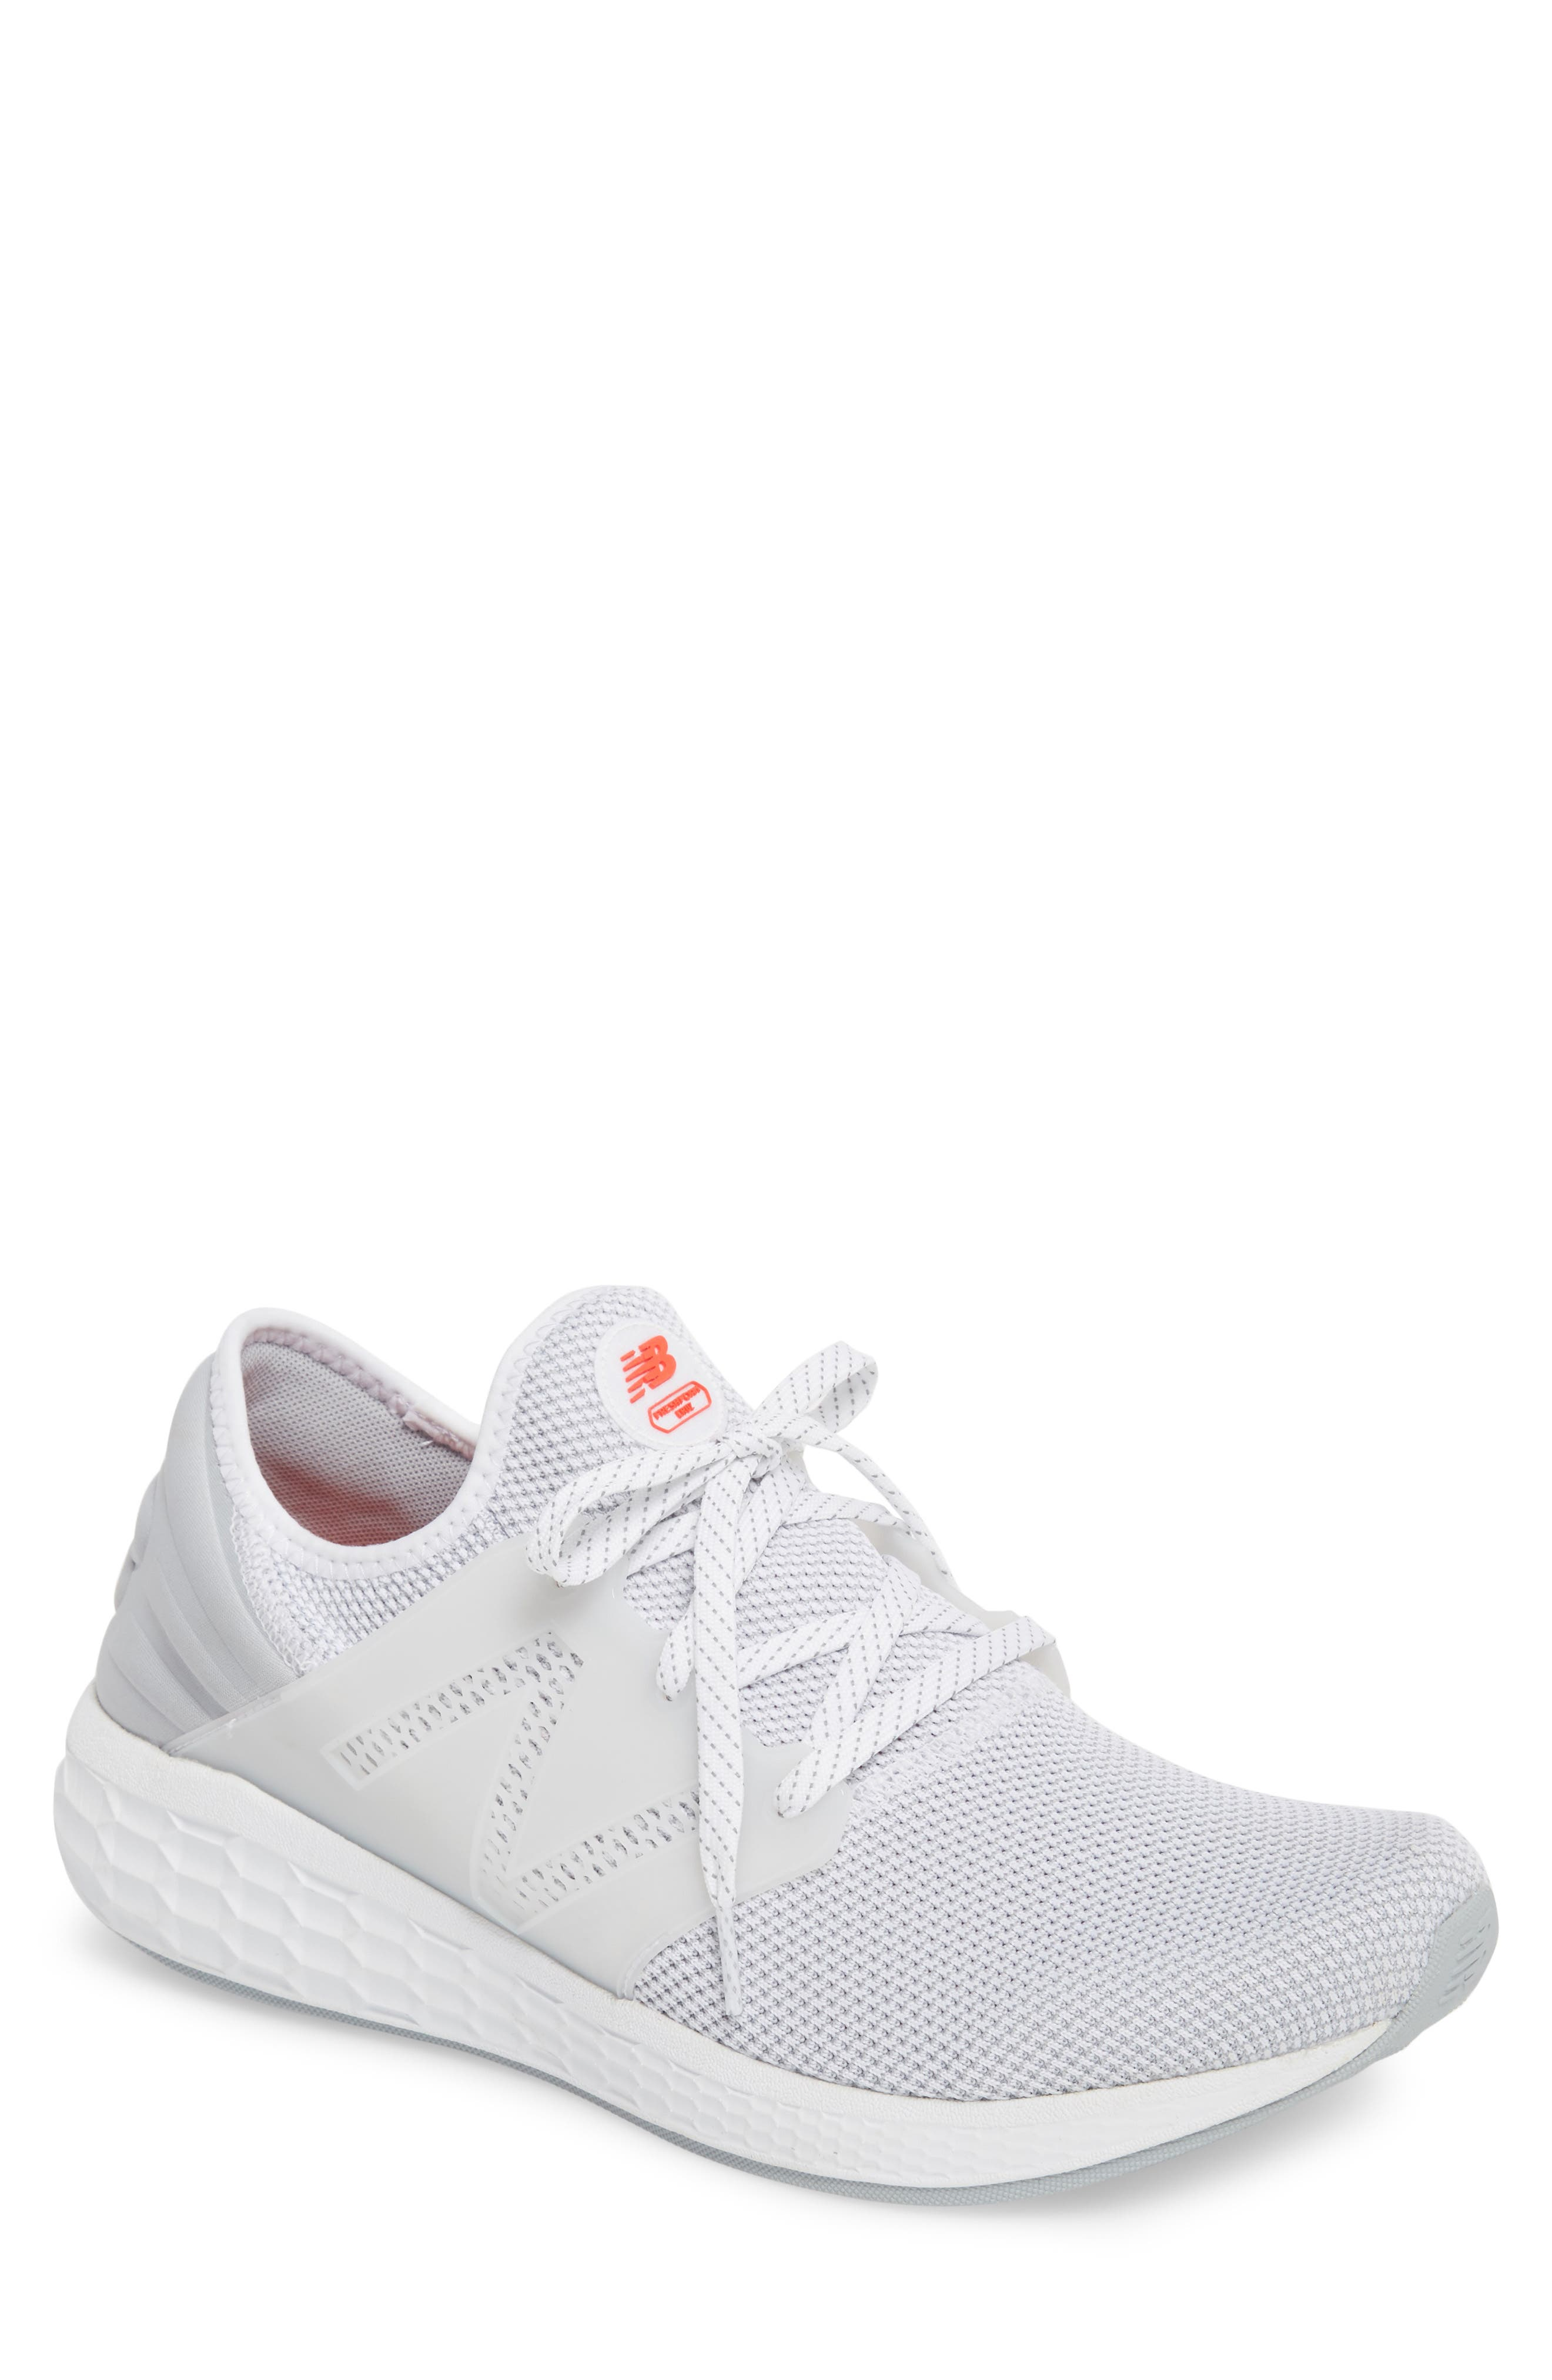 Fresh Foam Cruz v2 Sport Running Shoe,                             Main thumbnail 1, color,                             WHITE